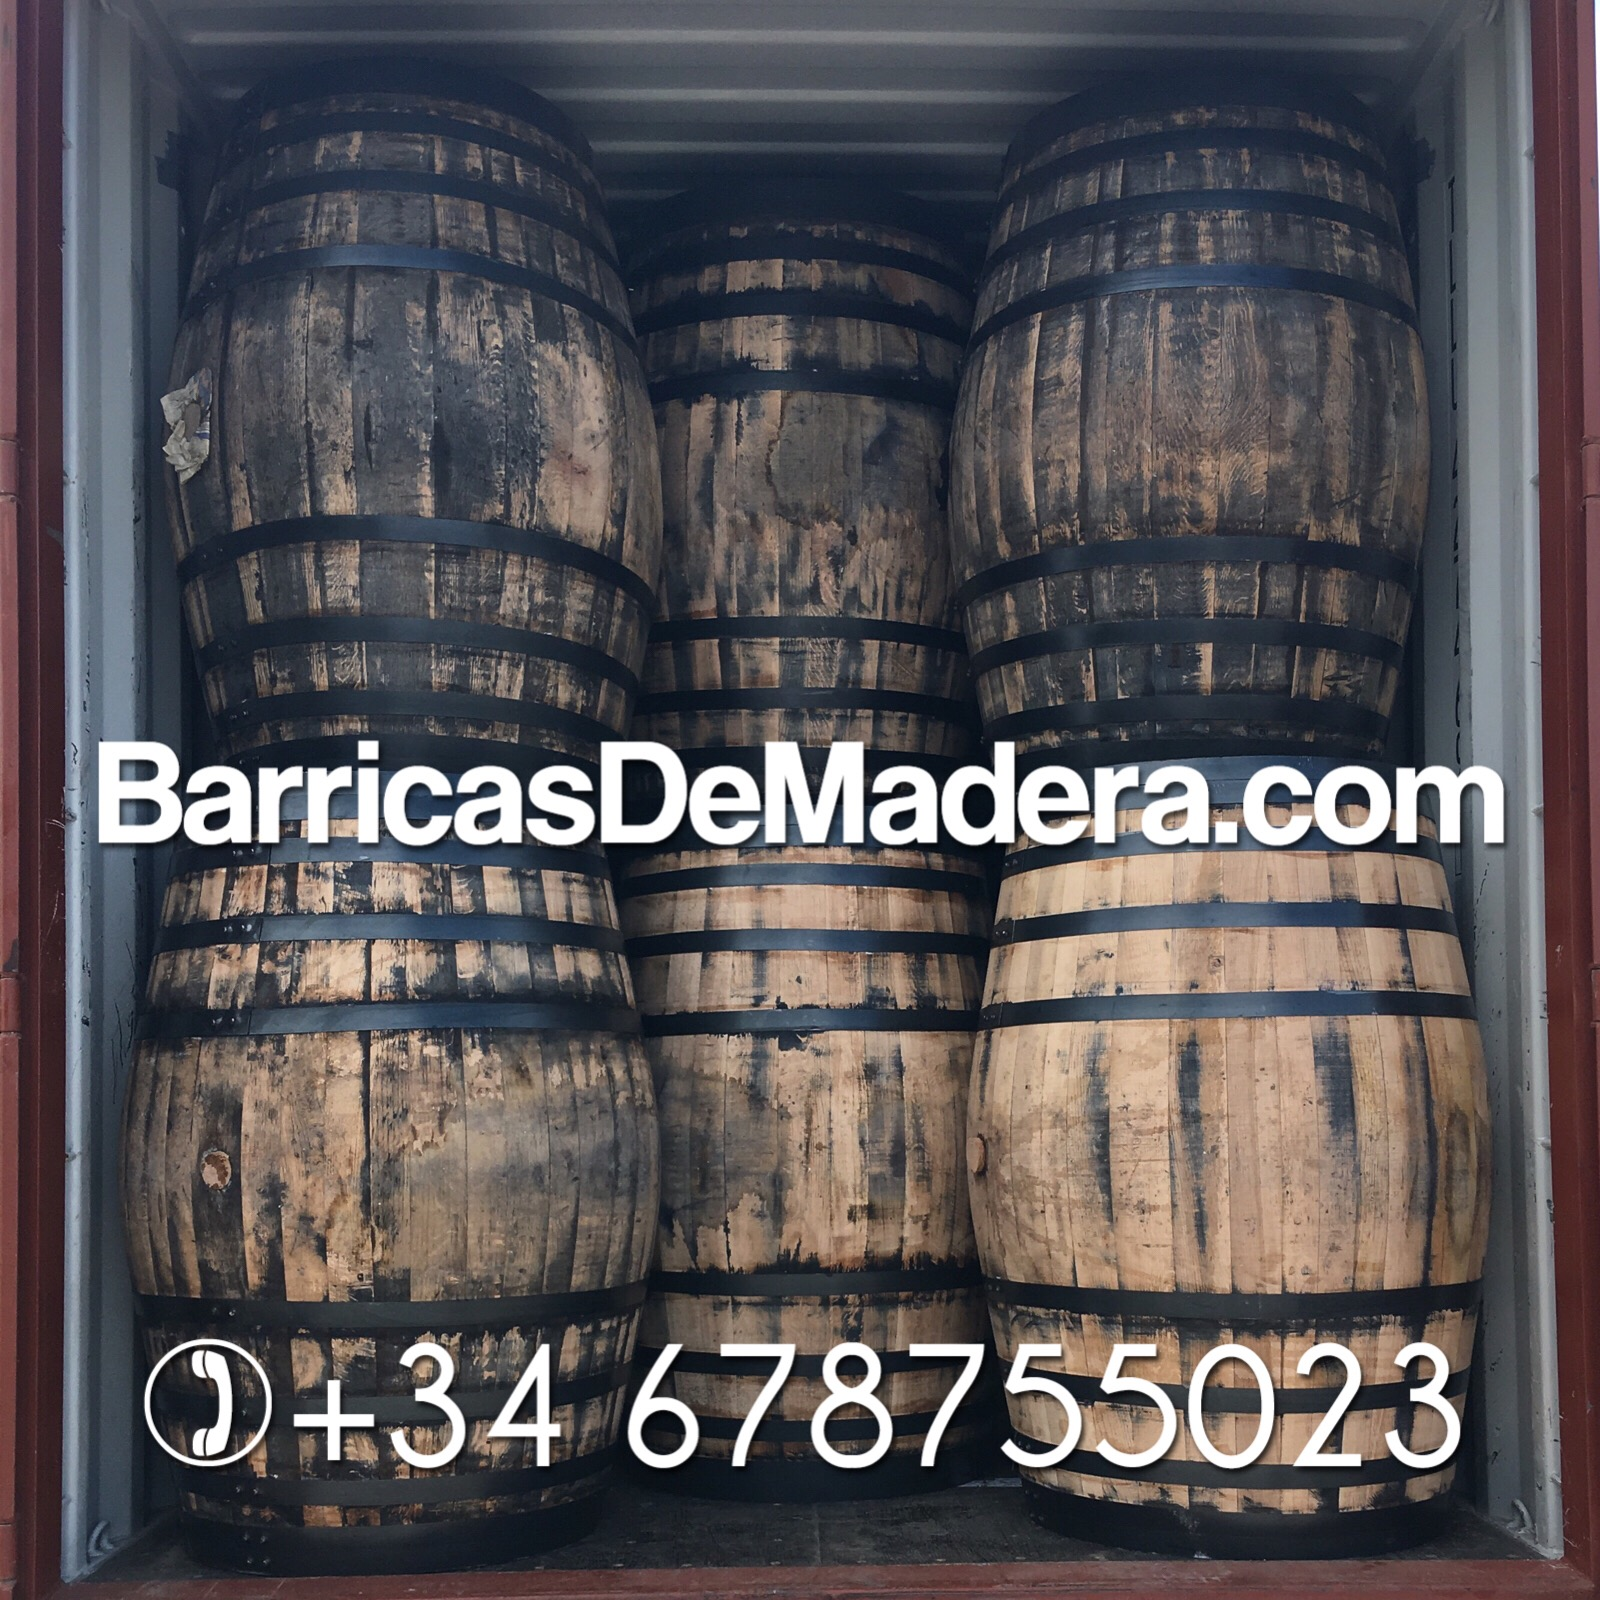 oloroso-sherry-casks-and-barrels